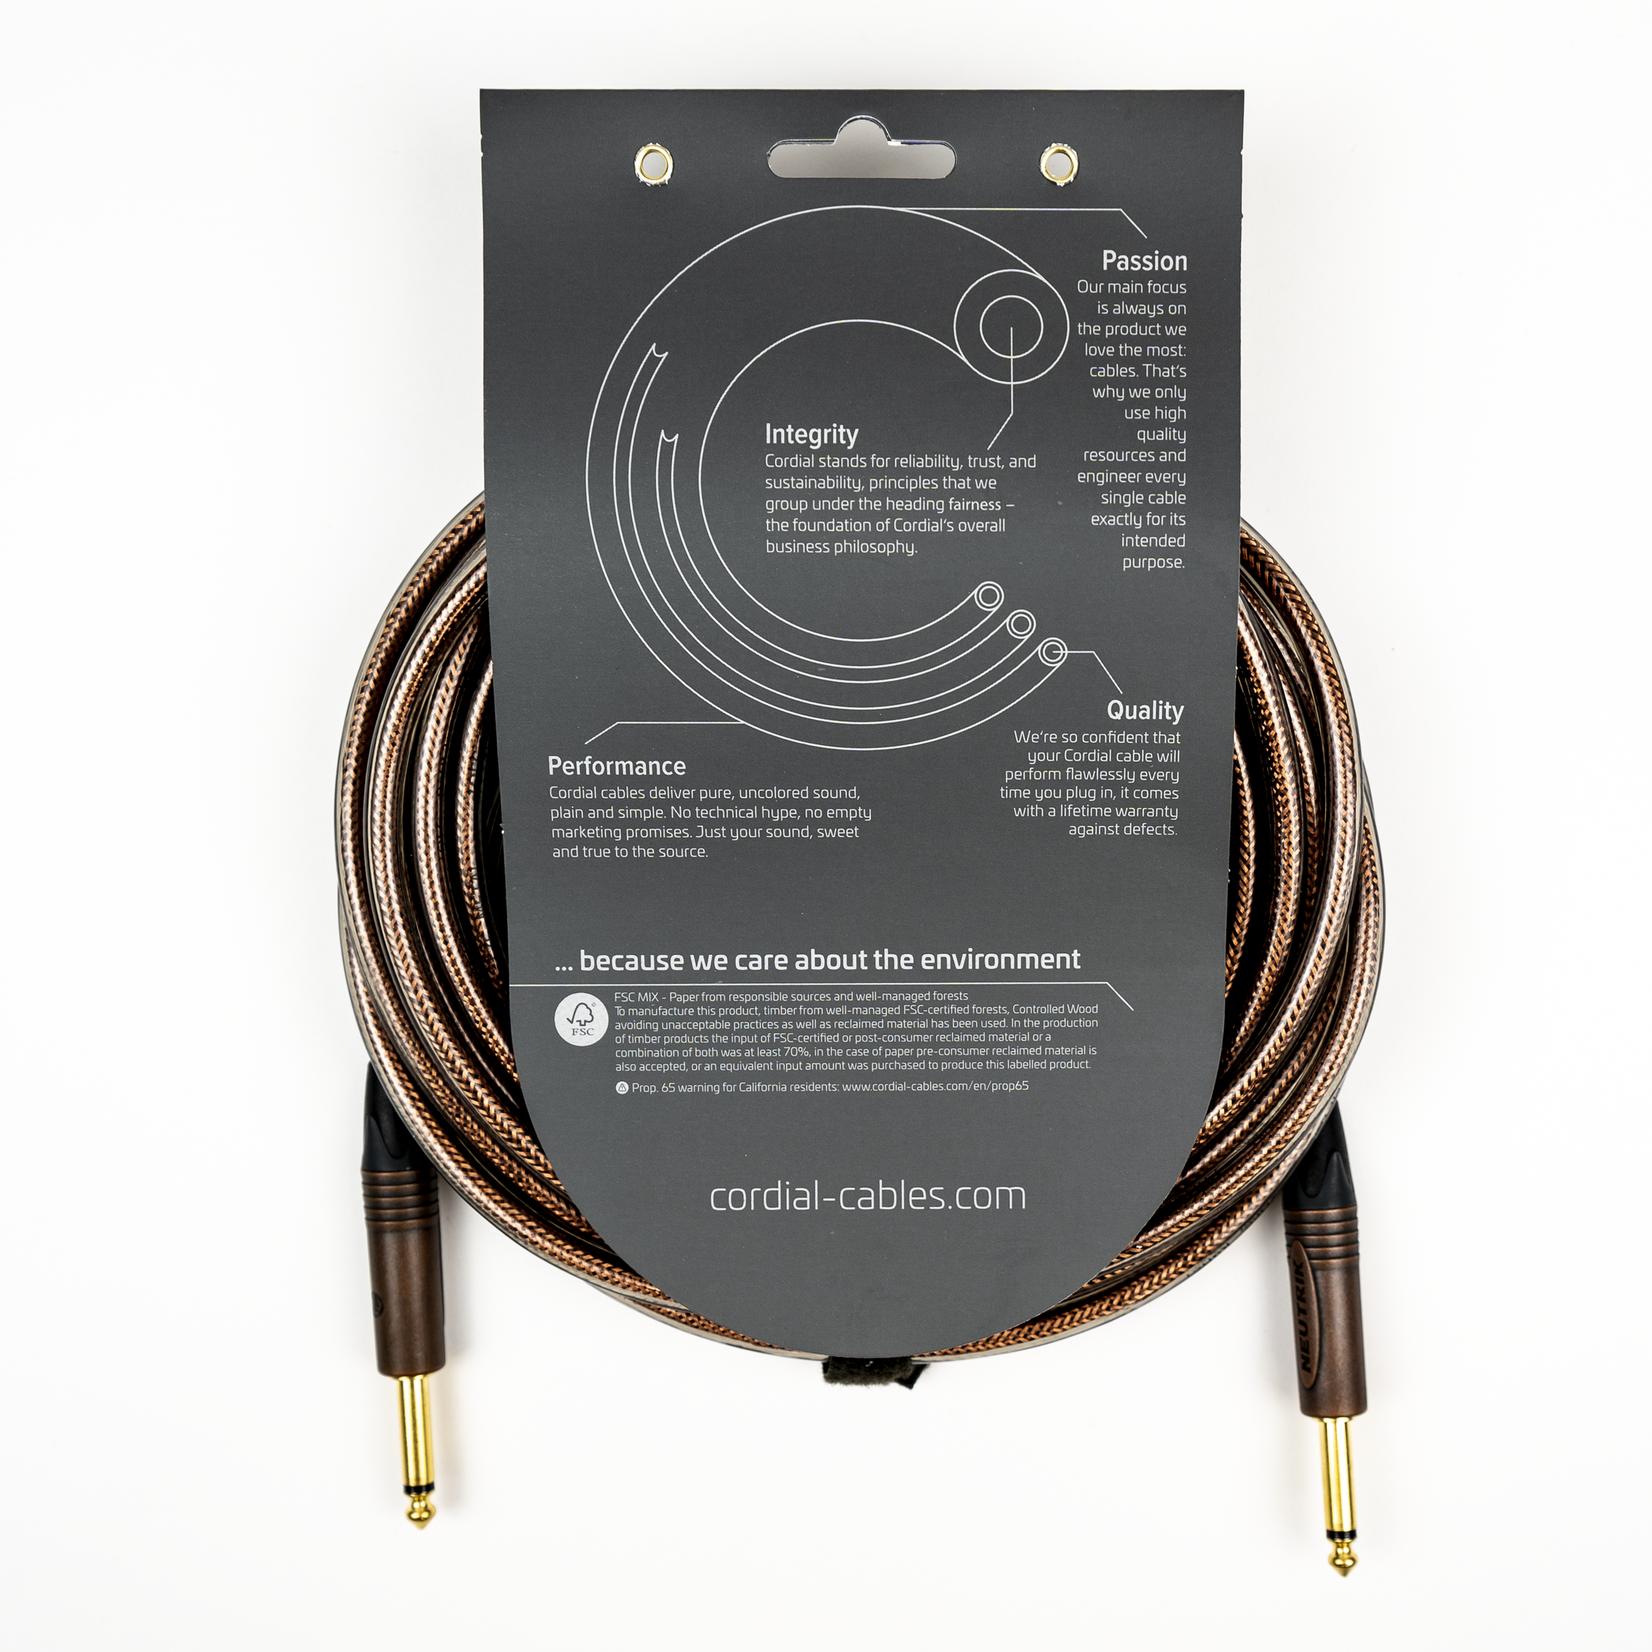 "Cordial Cables Cordial 20-foot (6m) Premium High-Copper ""Metal"" Instrument Cable, 1/4 Neutrik Connectors (CSI 6 PP-METAL)"